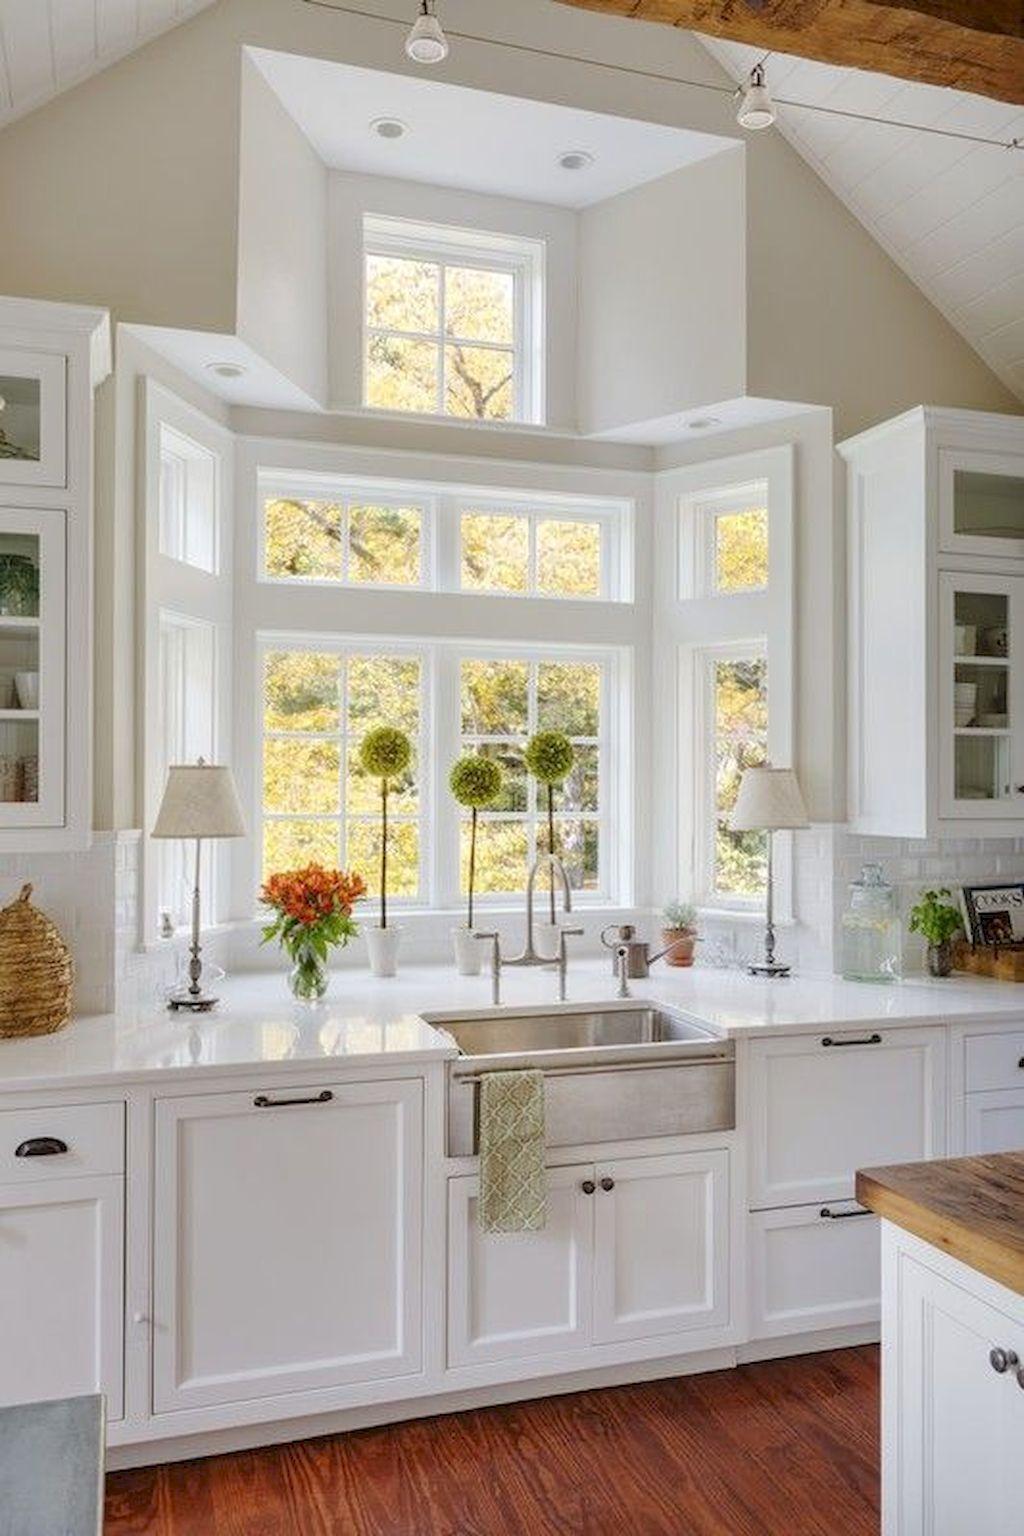 Rustic kitchen sink farmhouse style ideas (16 | Rustic kitchen sinks ...